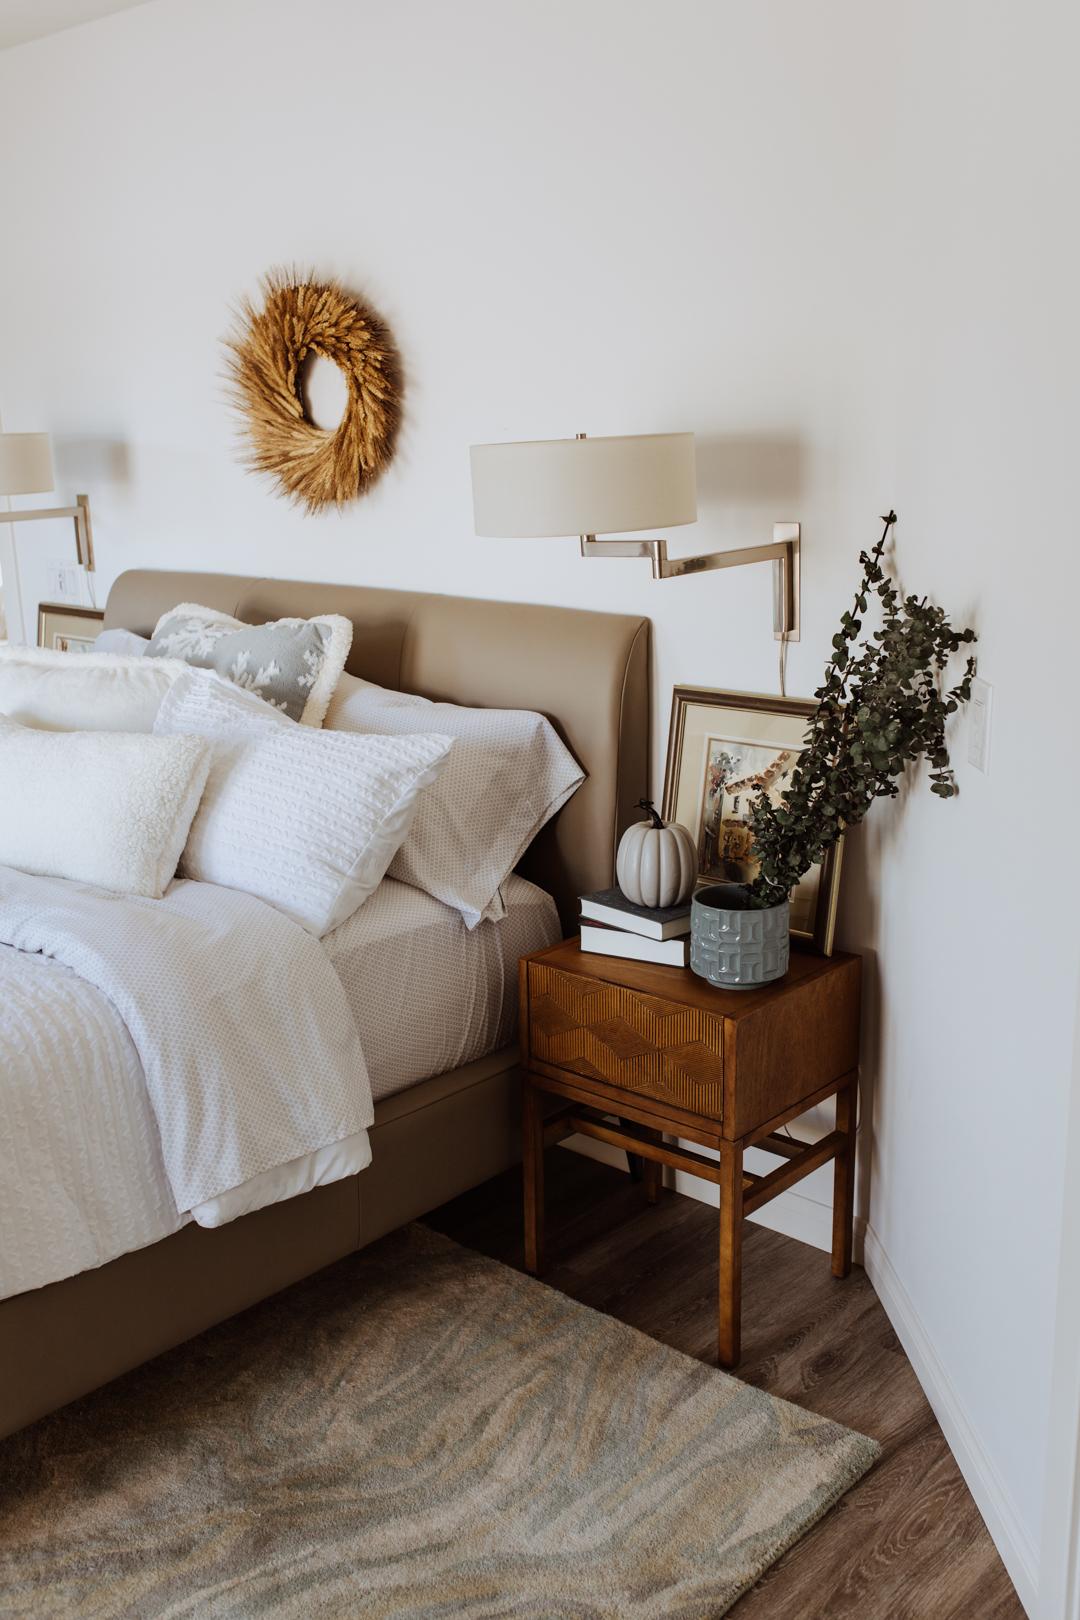 updating our guest room bedding for winter | thelovedesignedlife.com #winterbedding #KohlsFinds #guestroom #holidays @kohls #ad